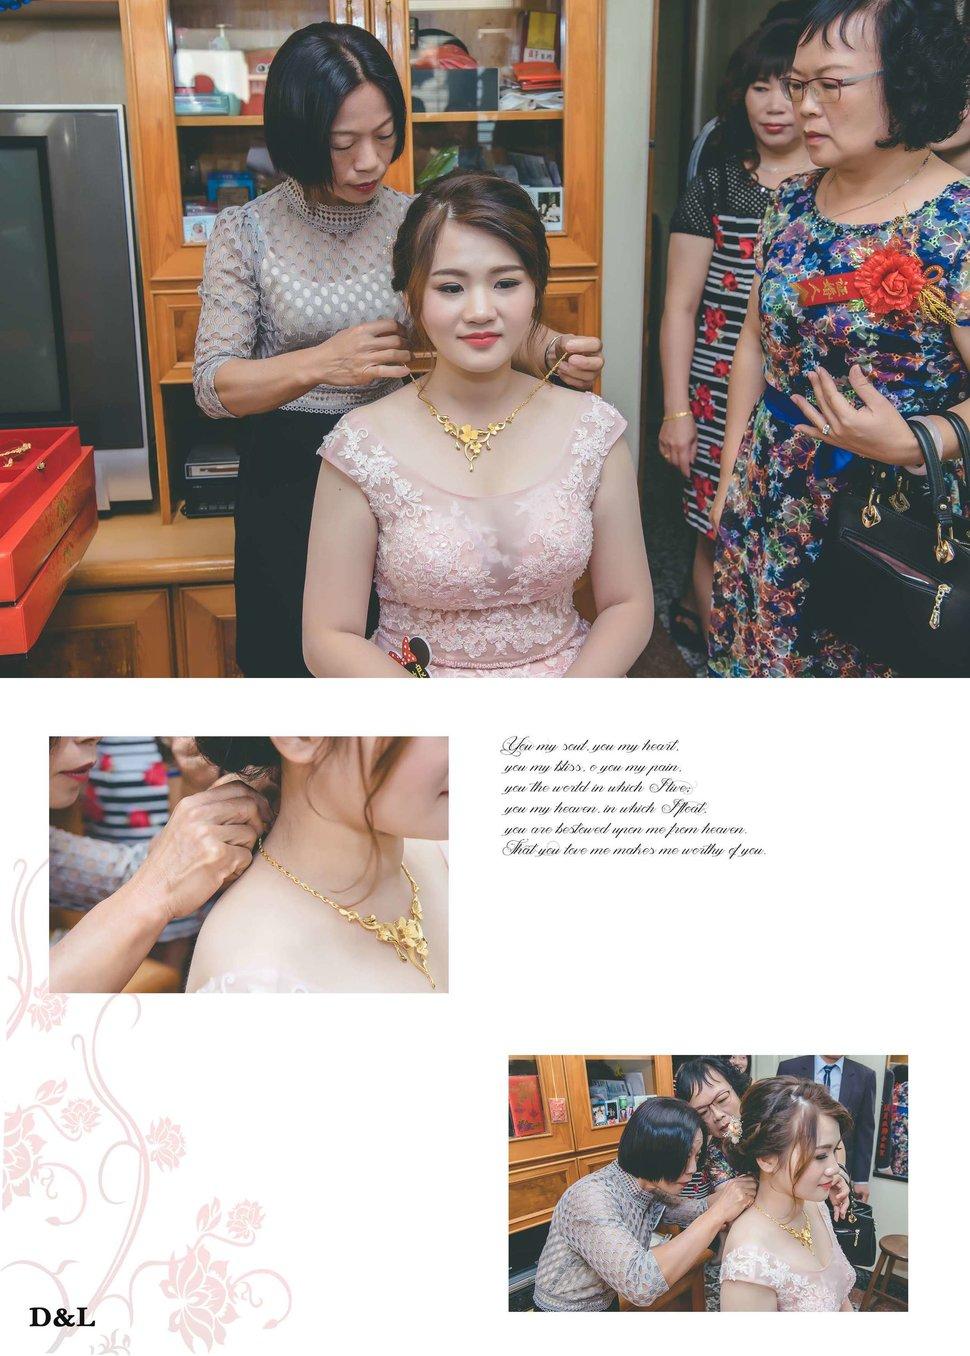 11 - D&L 婚禮事務 · 婚禮婚紗攝影 - 結婚吧